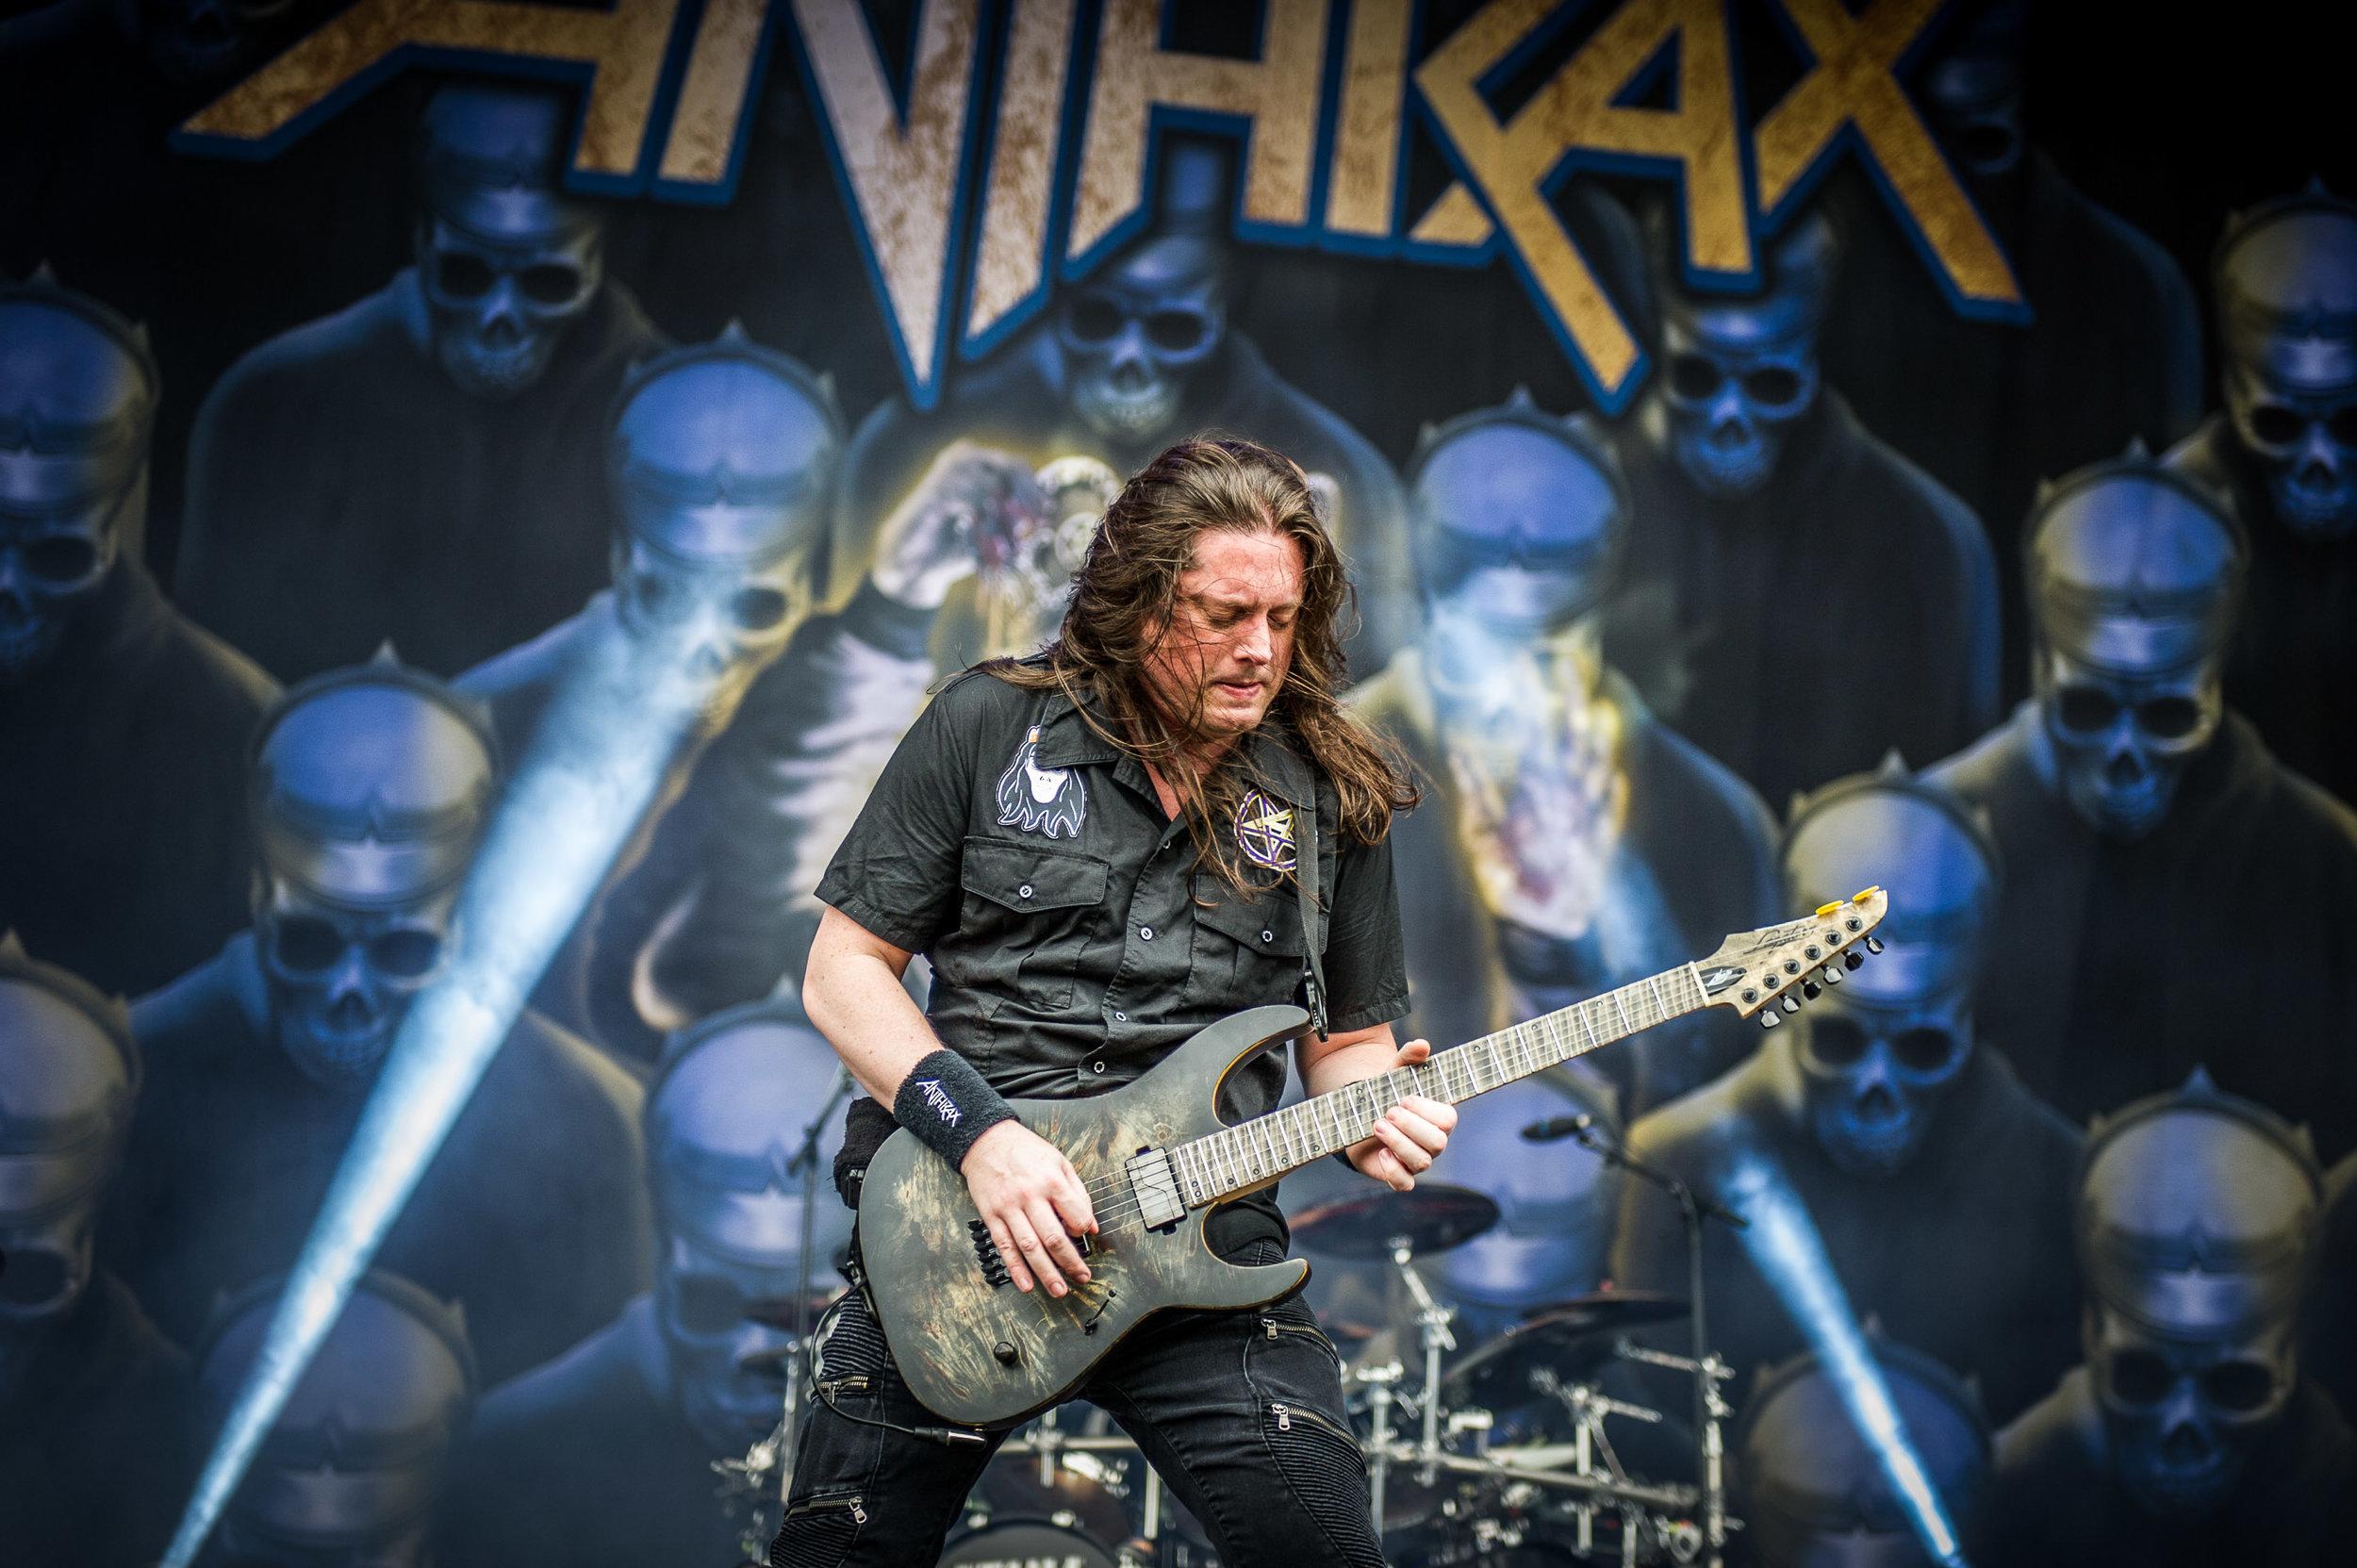 anthrax_download_sydney_05.jpg